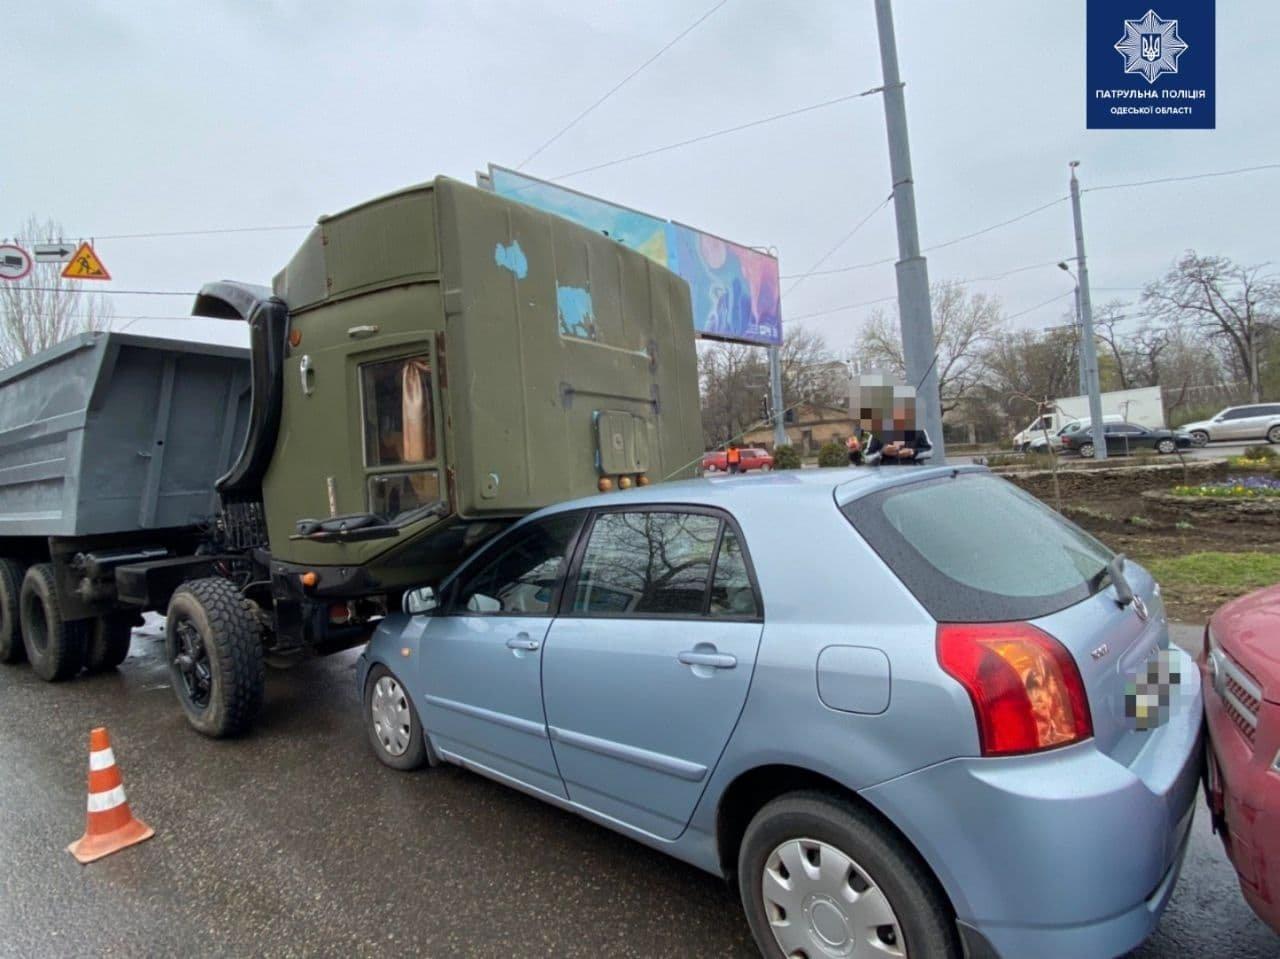 В Одессе произошло тройное ДТП, - ФОТО, фото-1